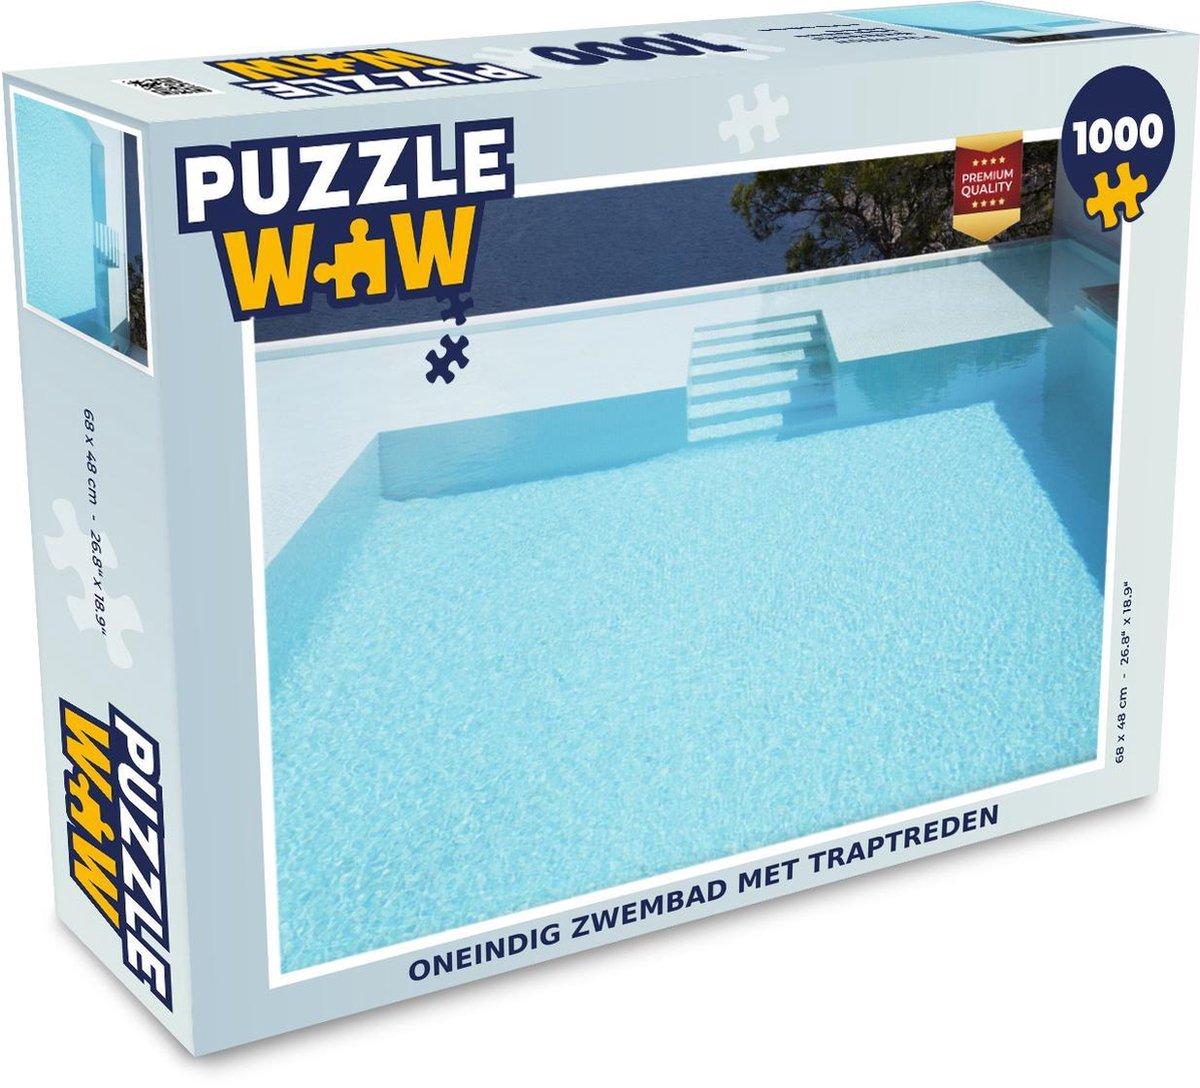 Puzzel 1000 stukjes volwassenen Zwembad zonder einde 1000 stukjes - Oneindig zwembad met traptreden puzzel 1000 stukjes - PuzzleWow heeft +100000 puzzels